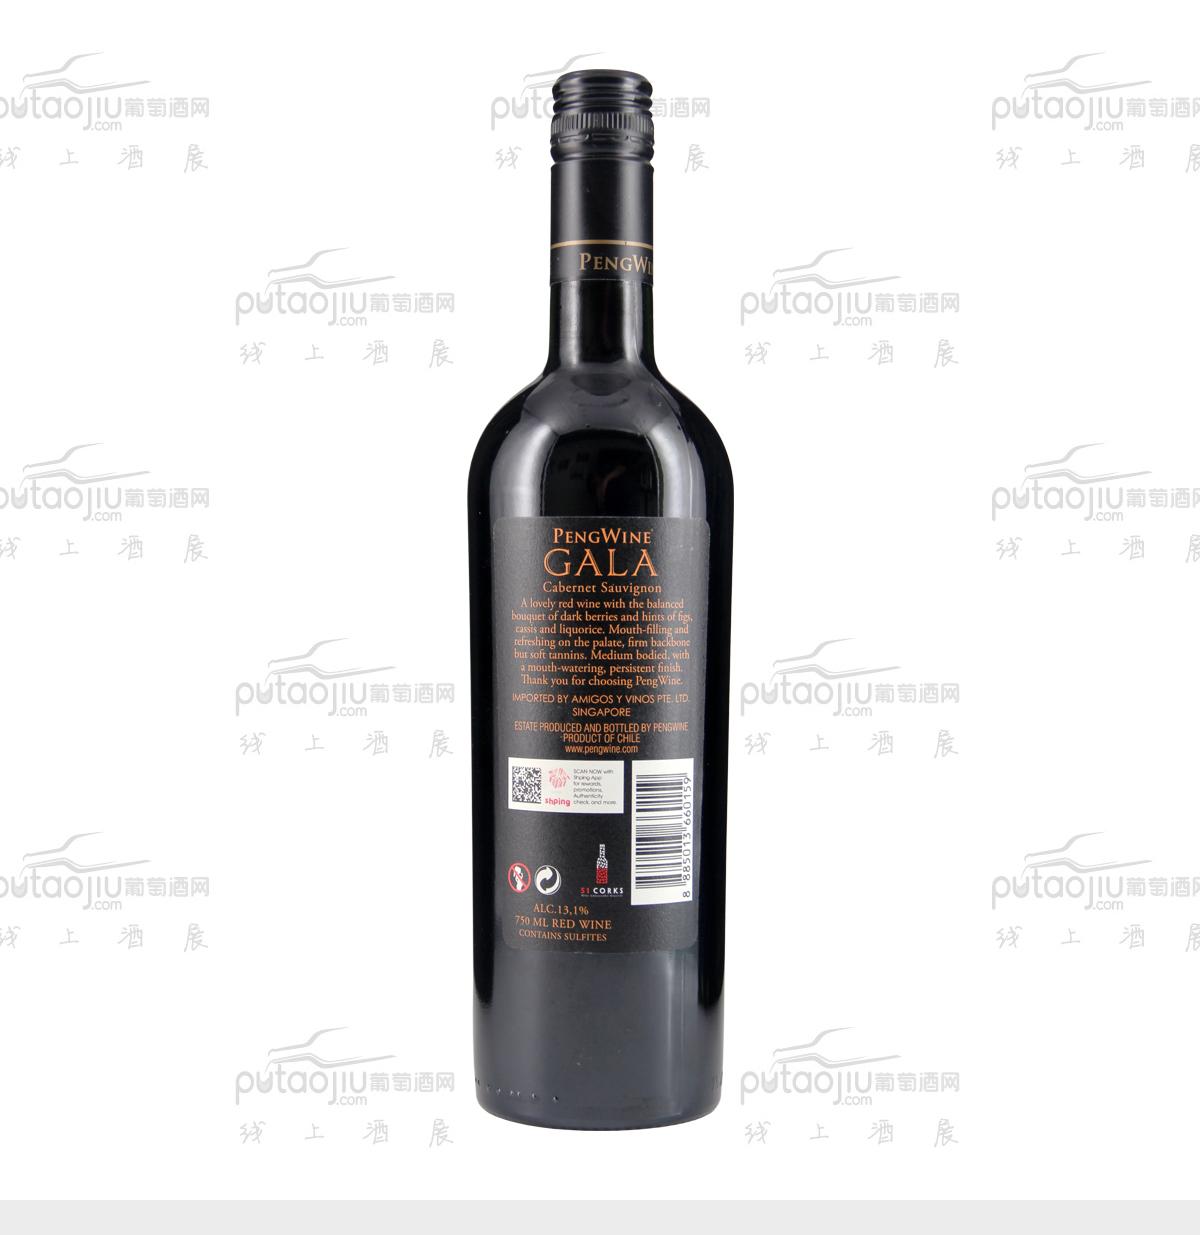 pengwine经典系列 嘉拉2009 干红赤霞珠葡萄酒